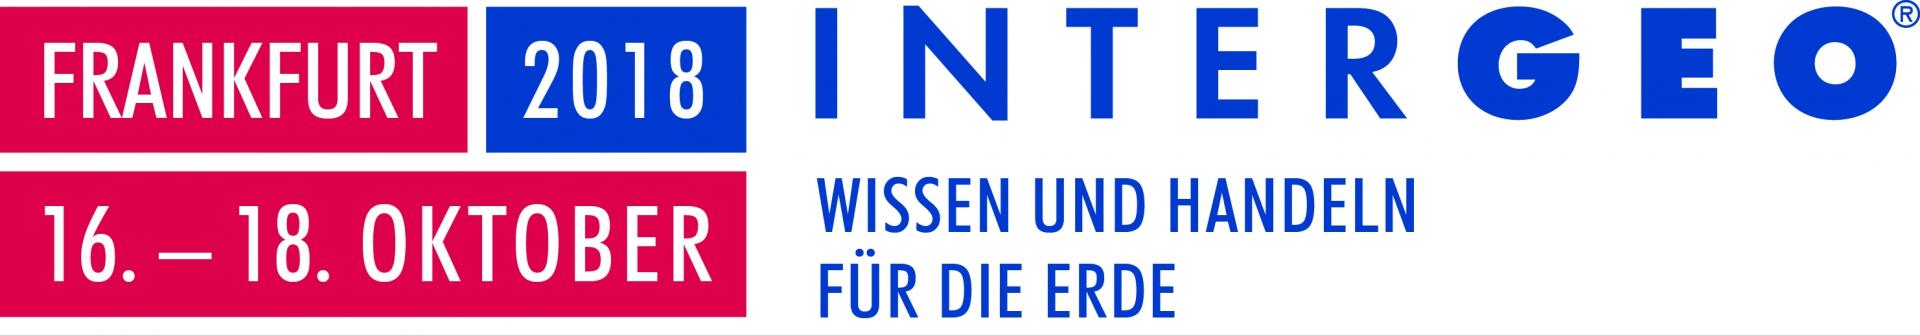 INTERGEO 2018 Frankfurt